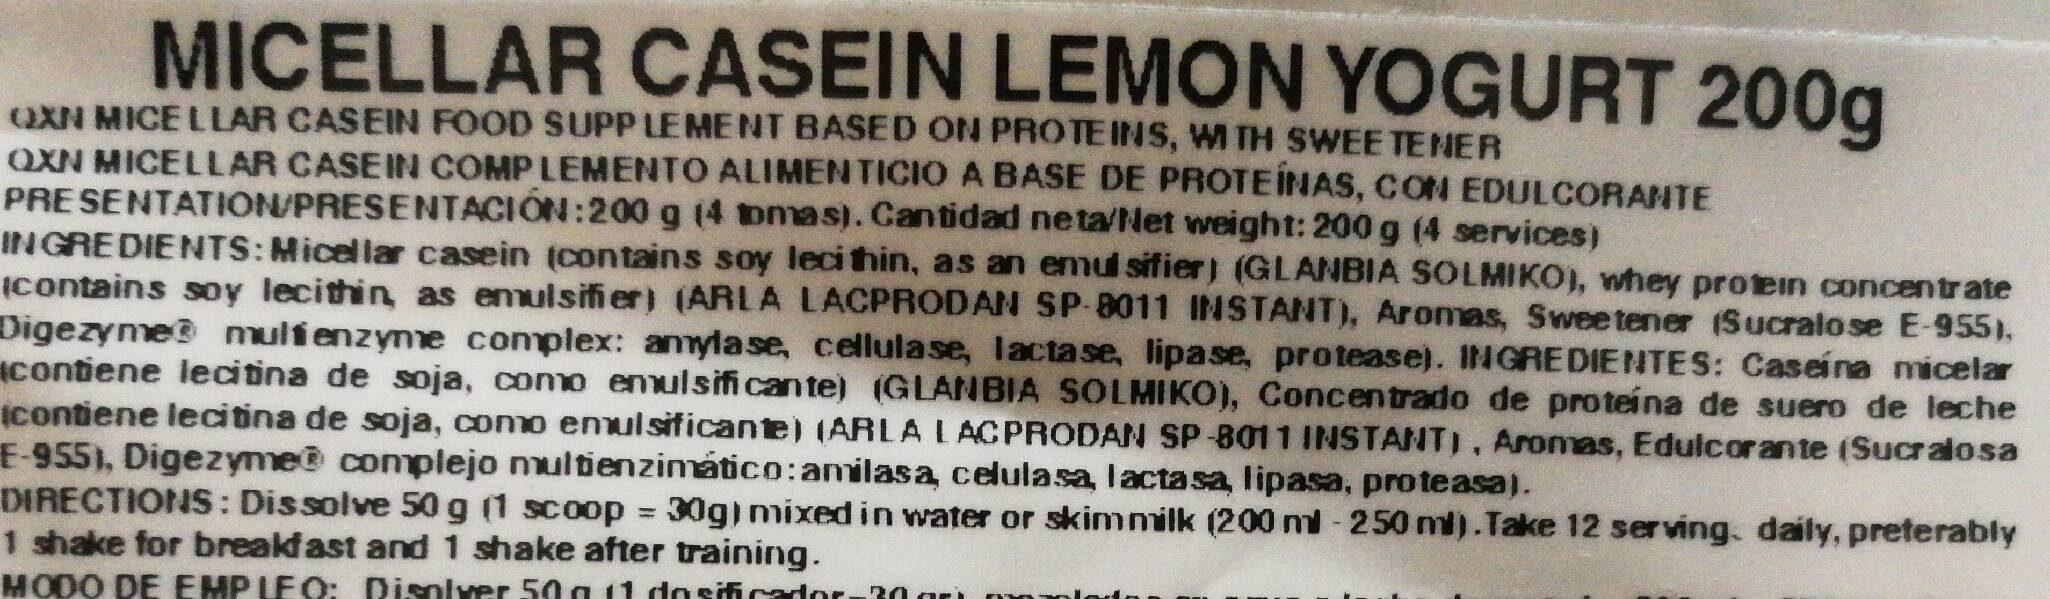 Miscellar casein - Informations nutritionnelles